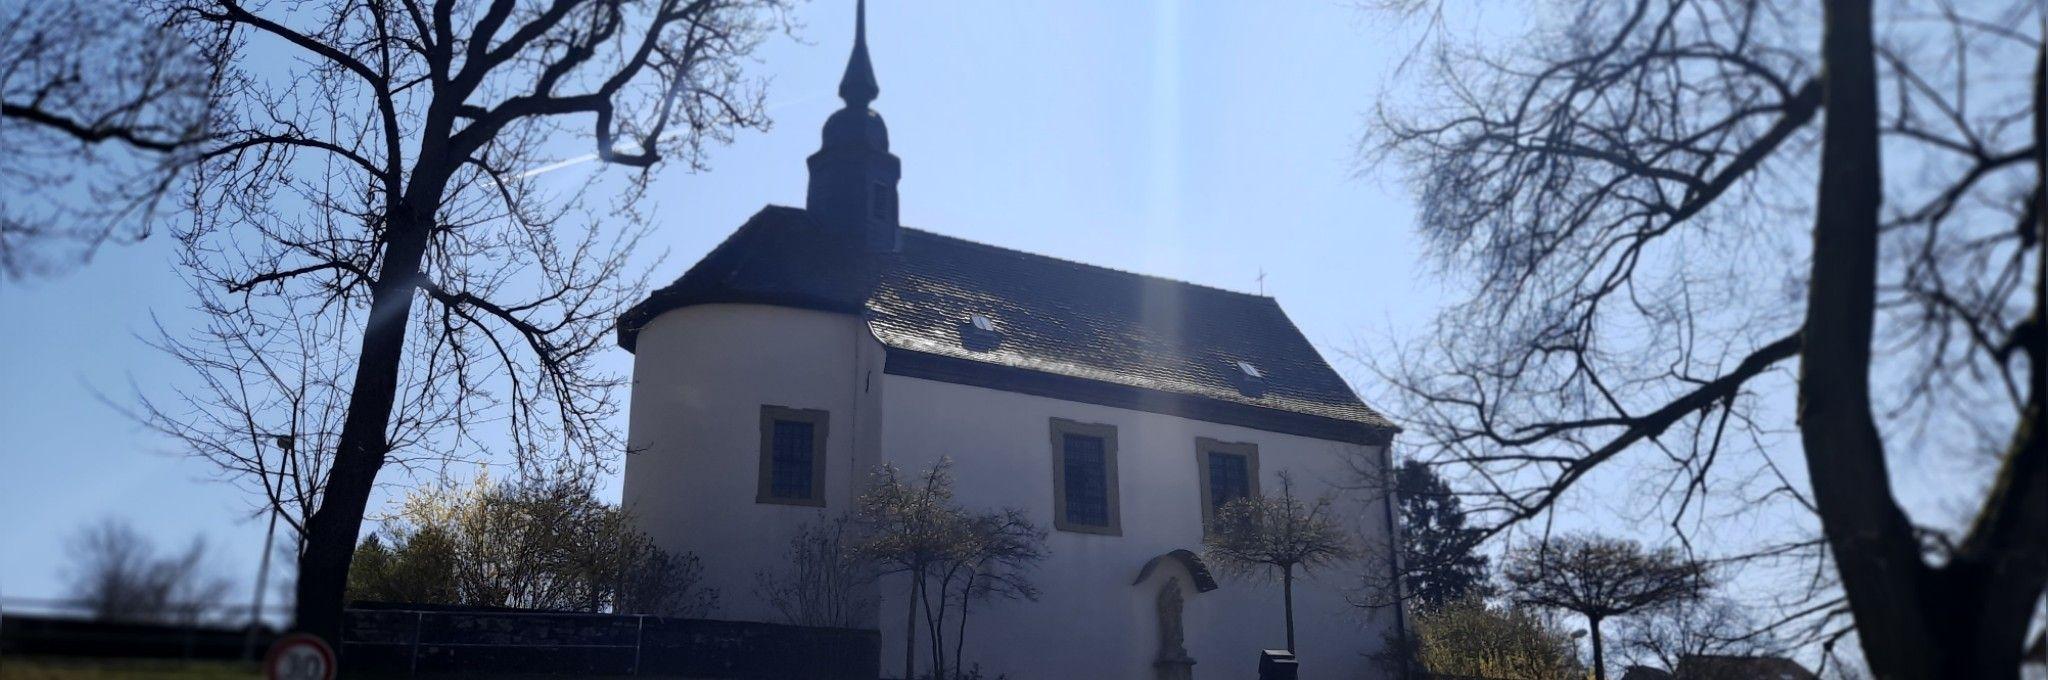 Sebastiani- Kapelle